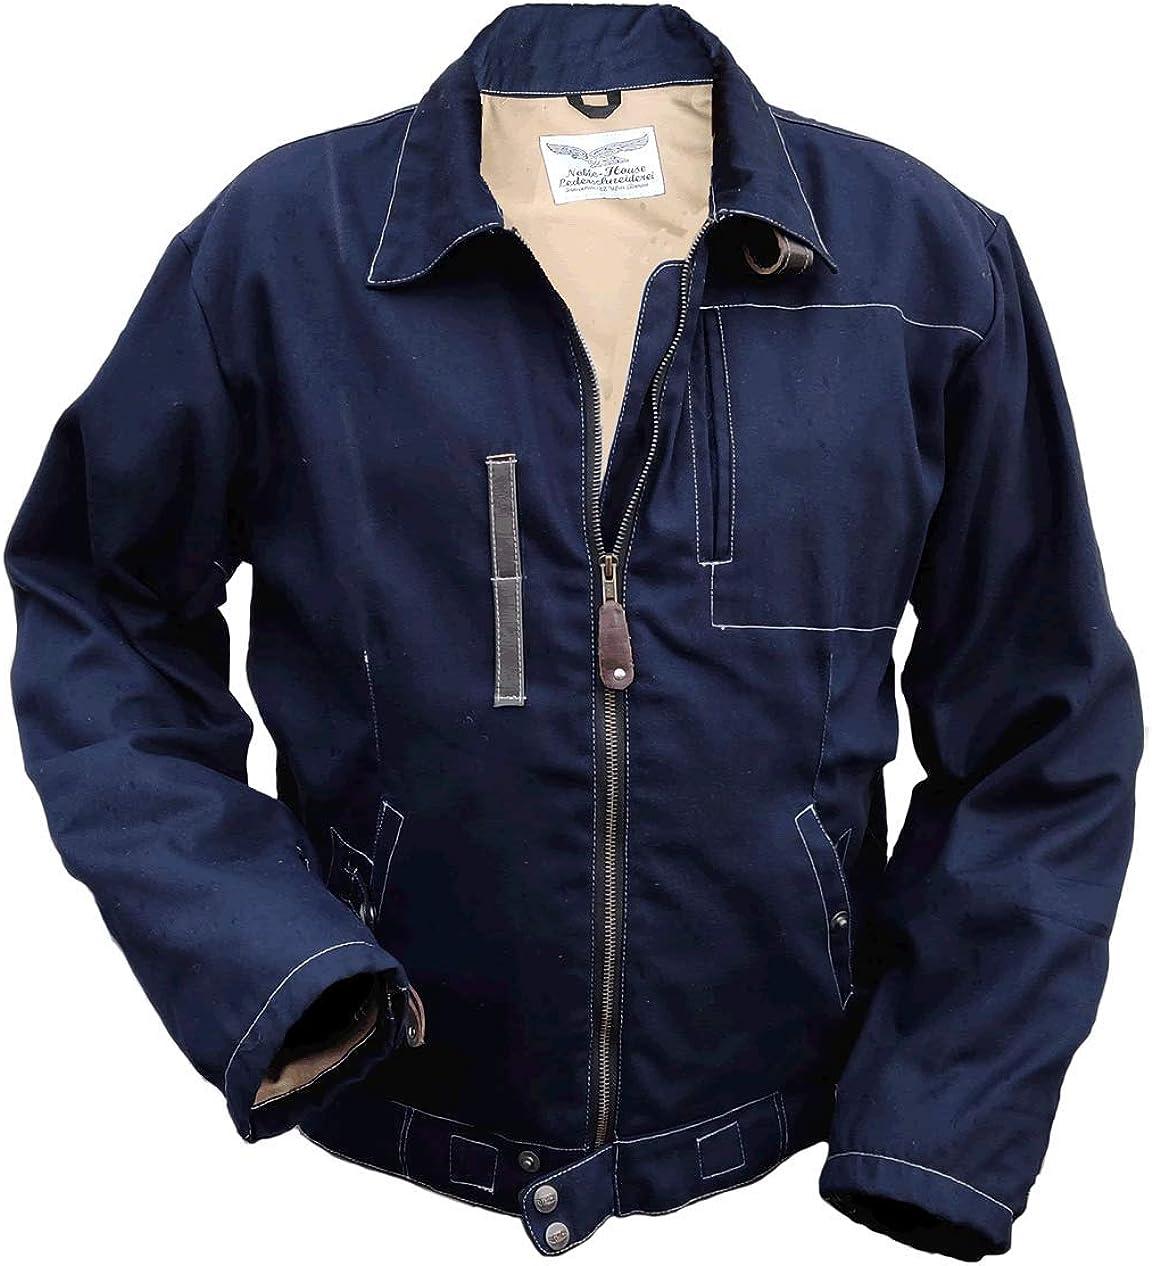 Noble House Me 262 Flight Jacket Summer Edition At Amazon Men S Clothing Store